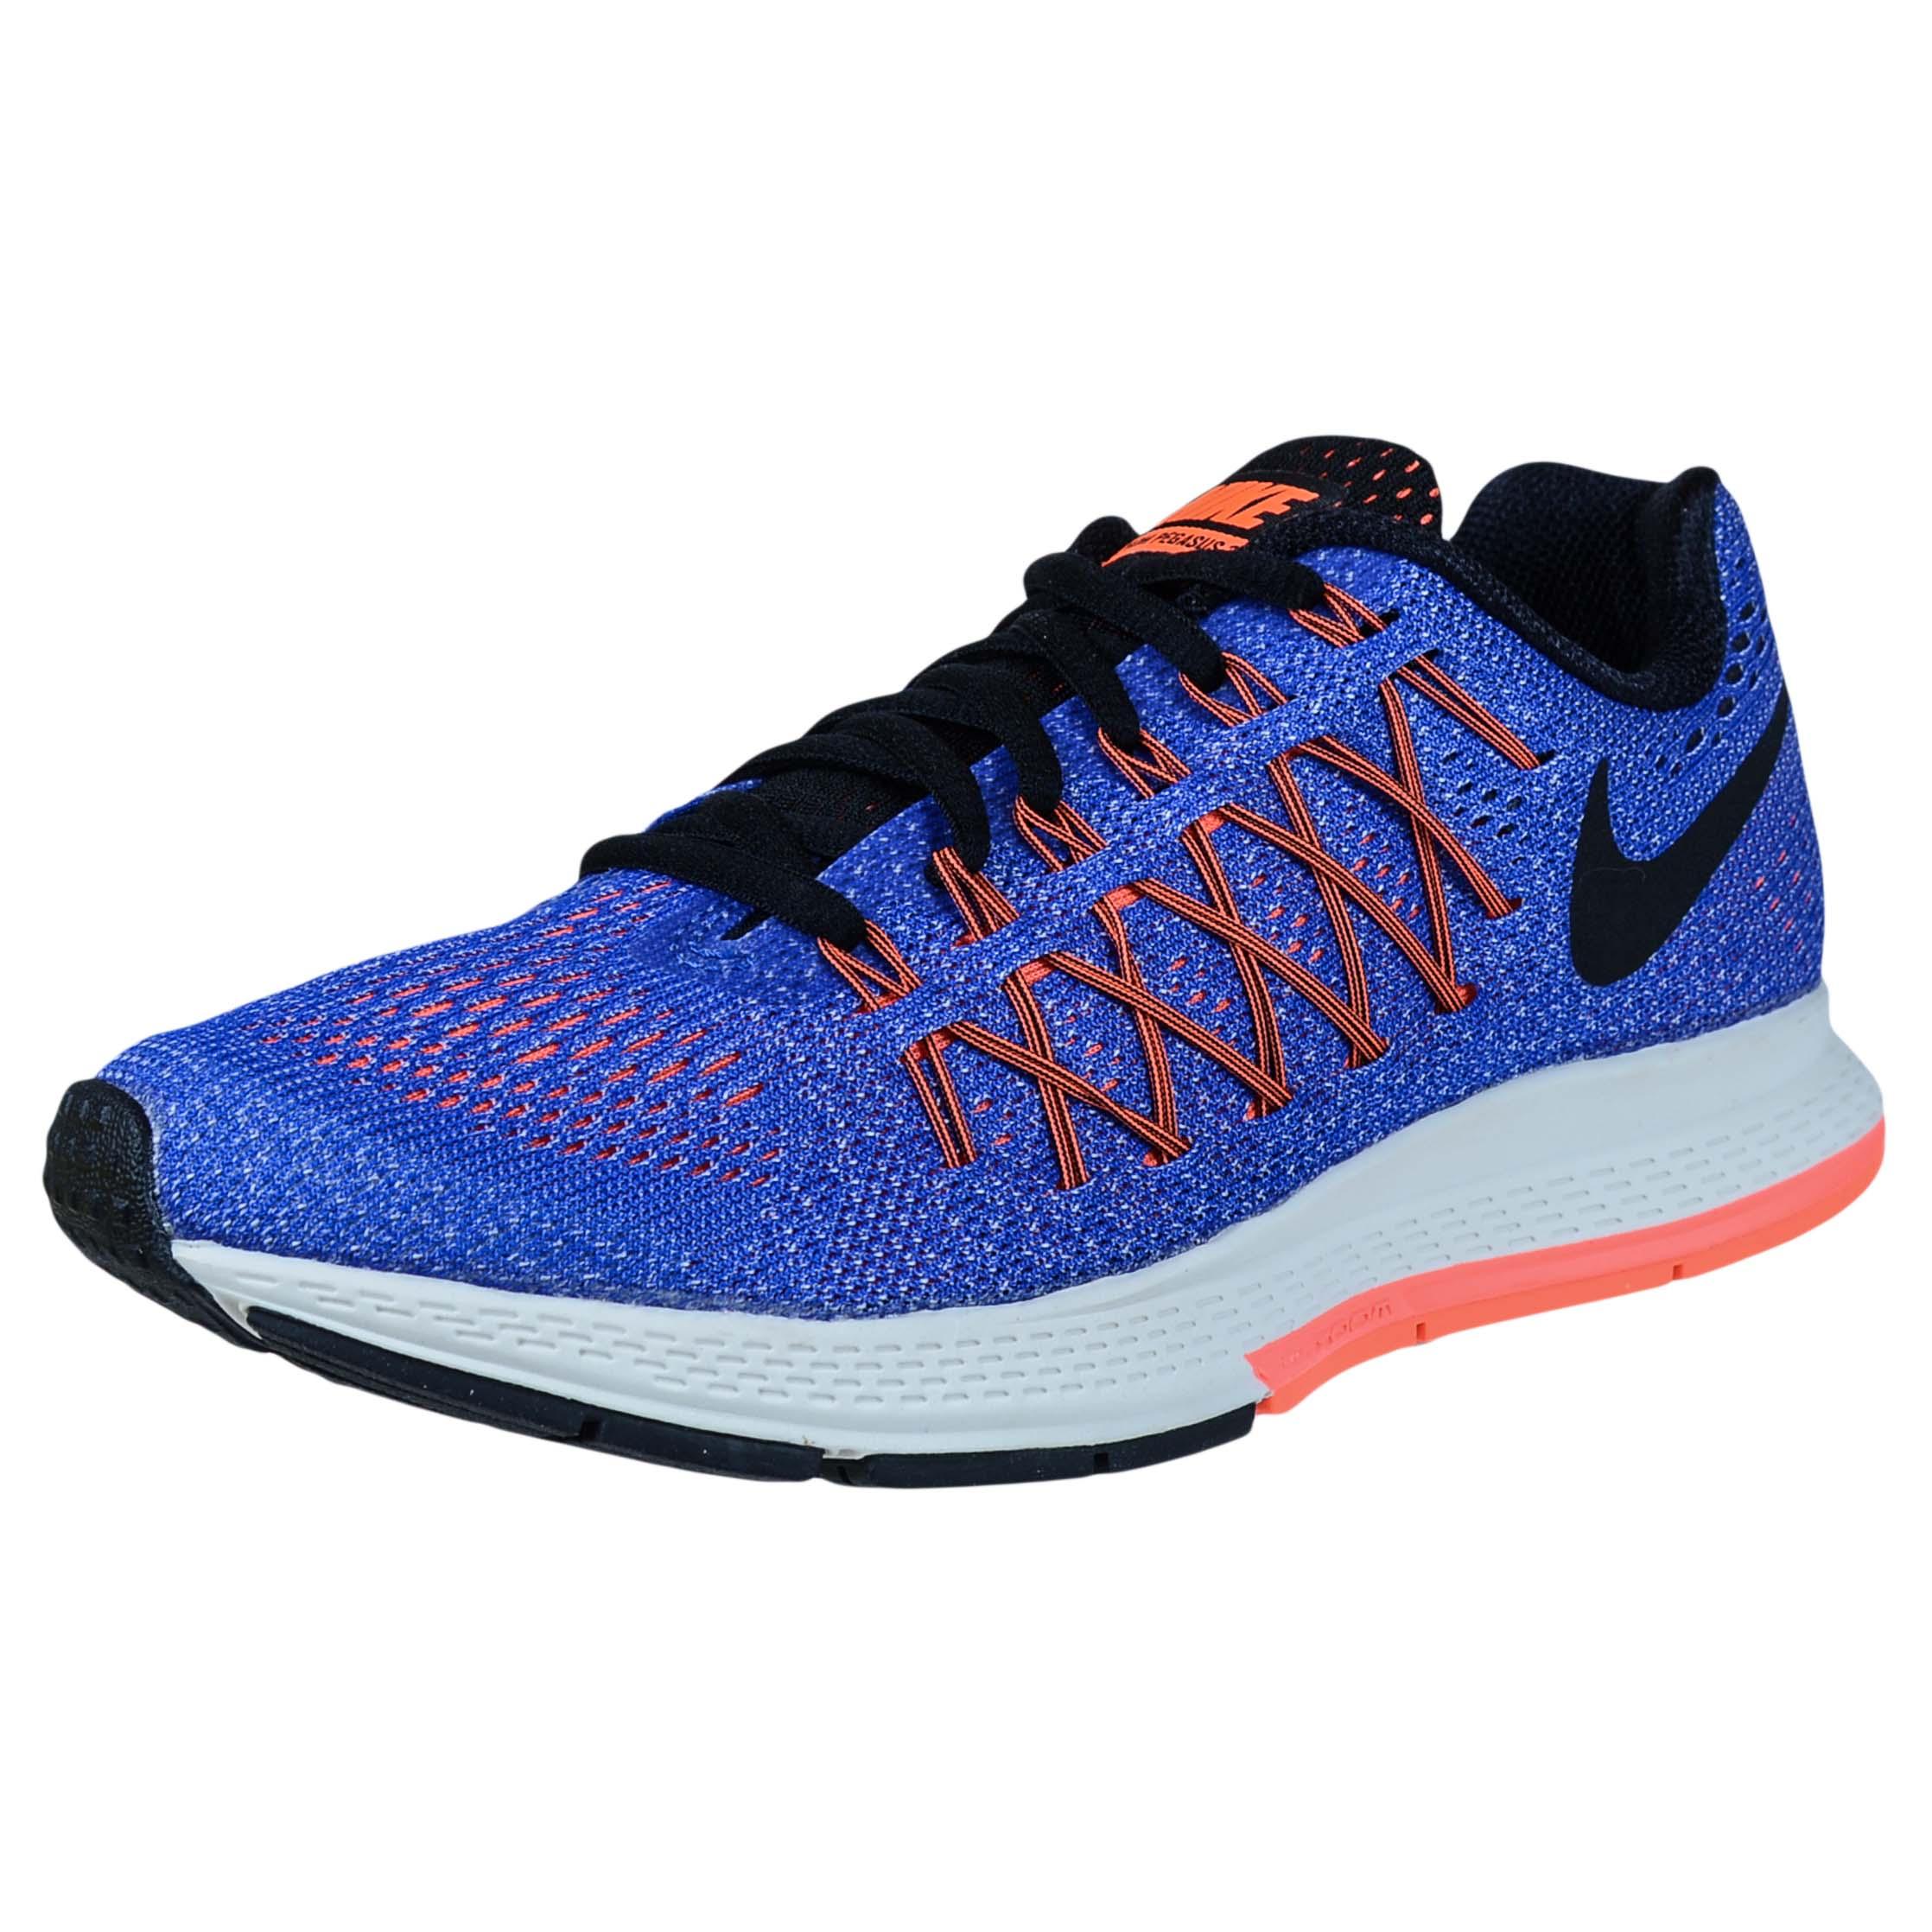 Nike WOMENS AIR ZOOM PEGASUS 32 RACER BLUE BLACK ORANGE R...